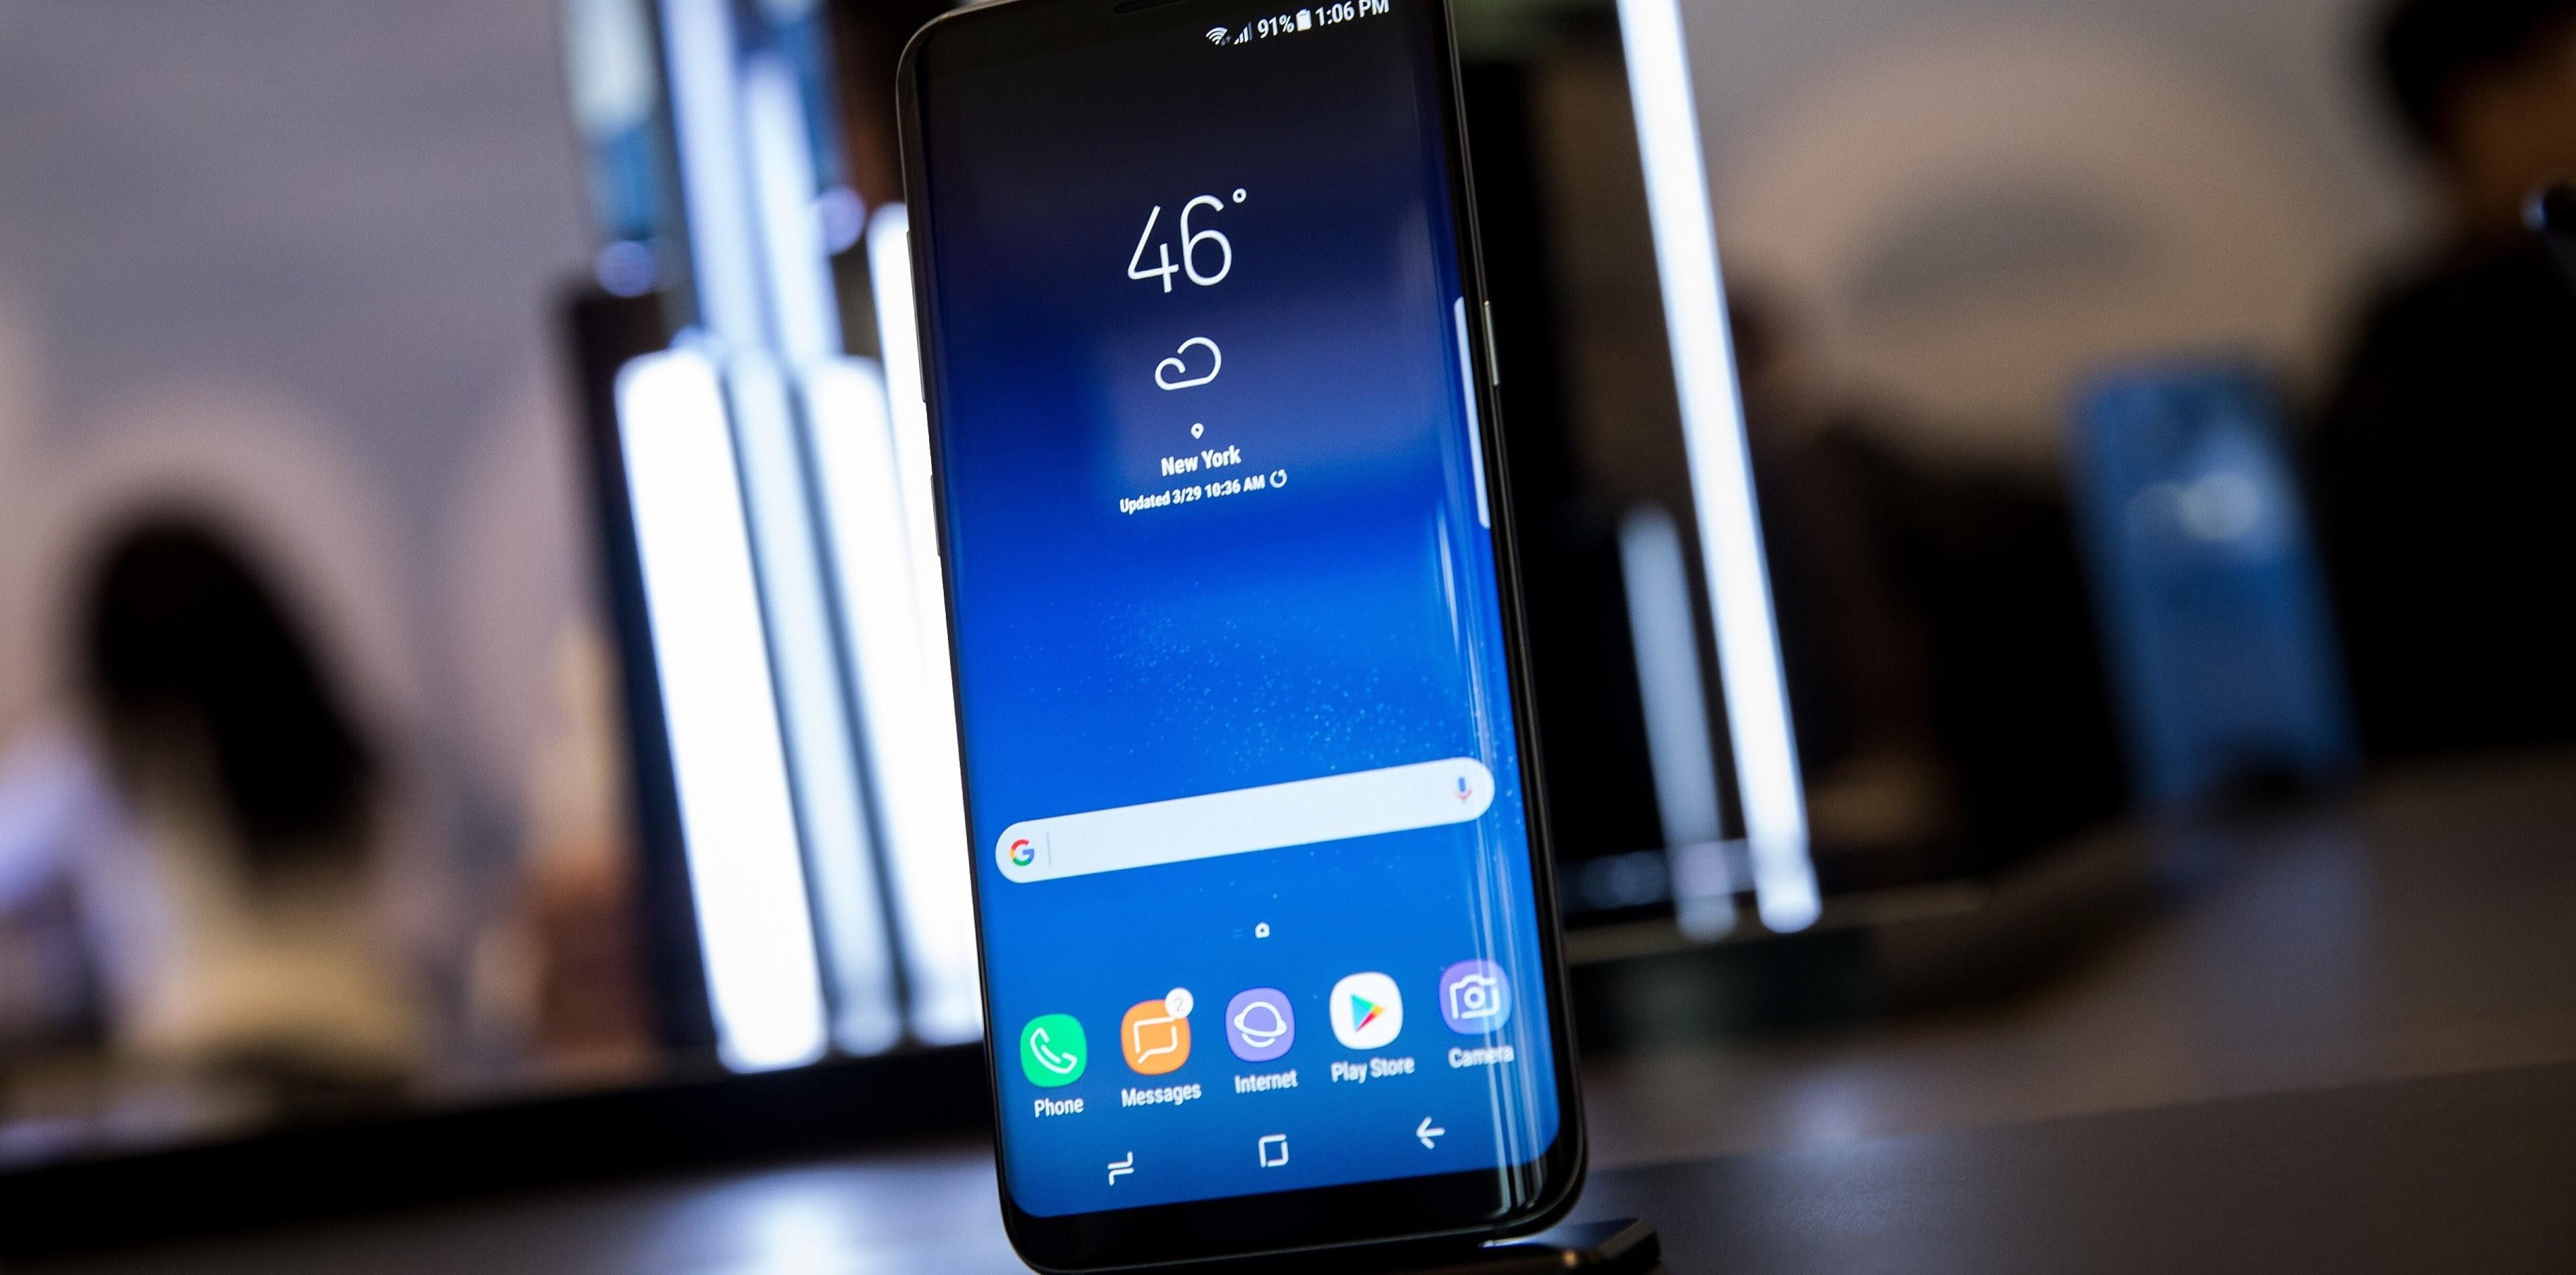 Samsung Galaxy S8 4k Hd Wallpaper Samsung Galaxy